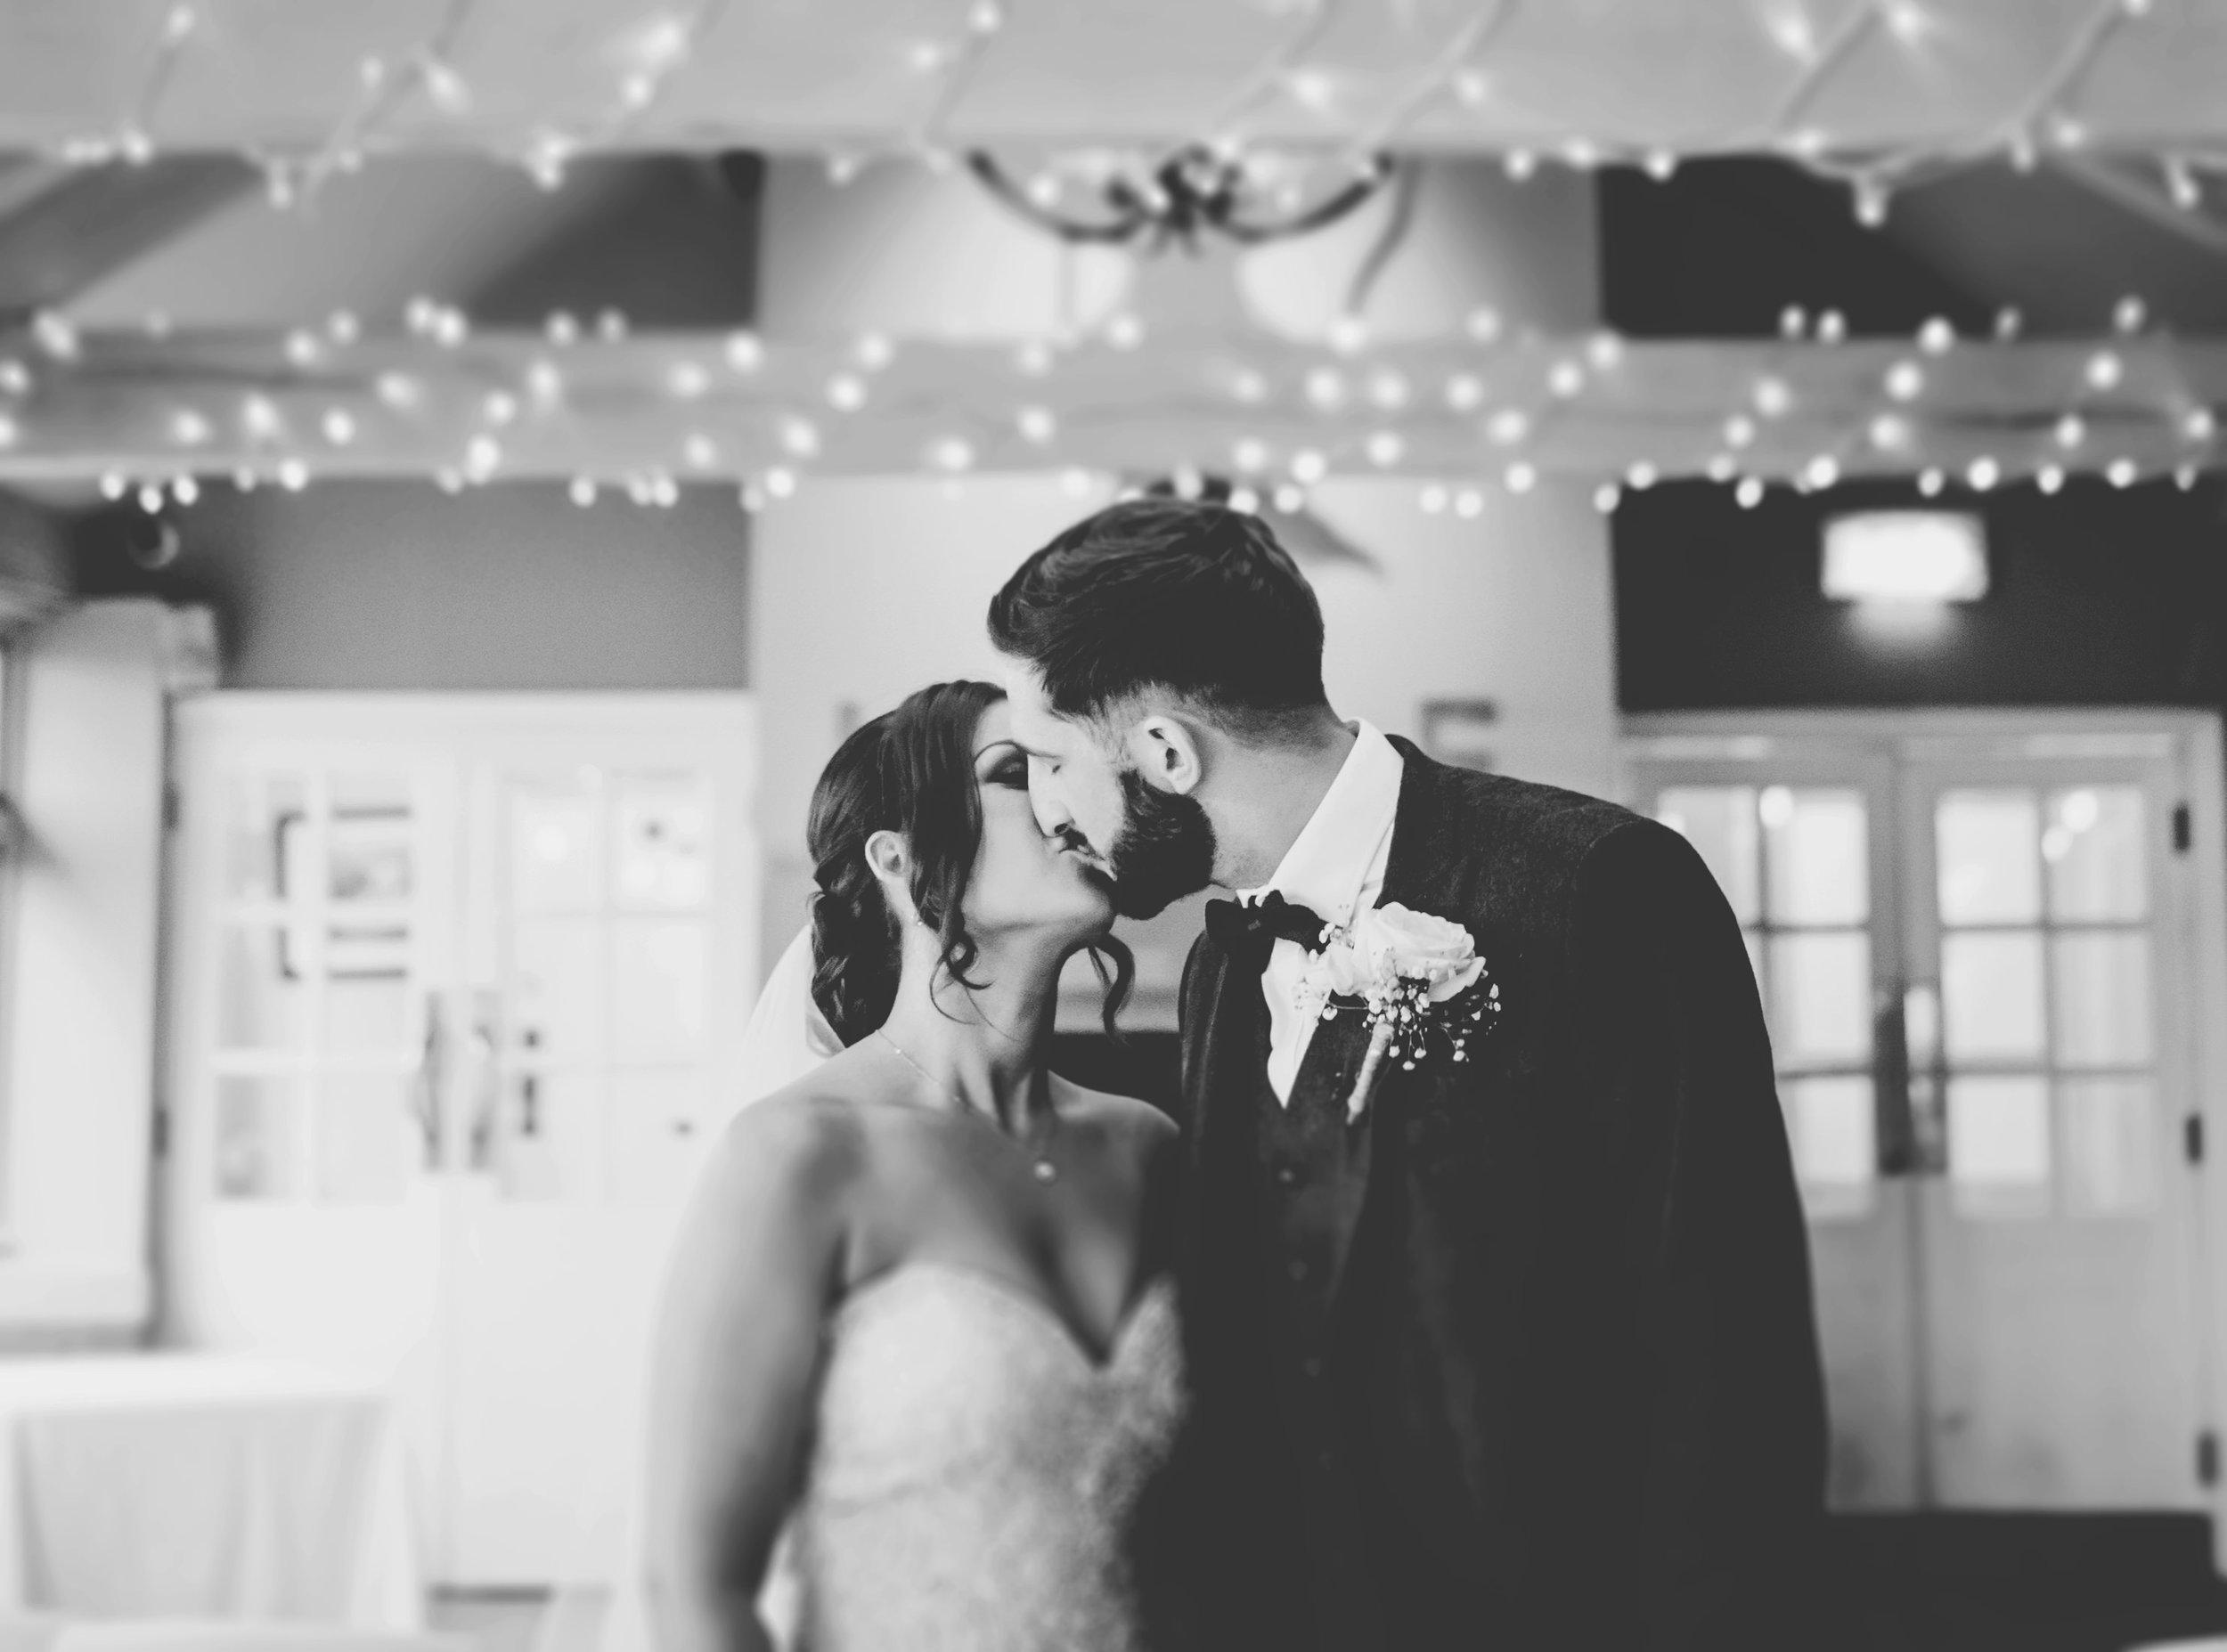 stylish wedding photography at the Alma Inn Lancashire